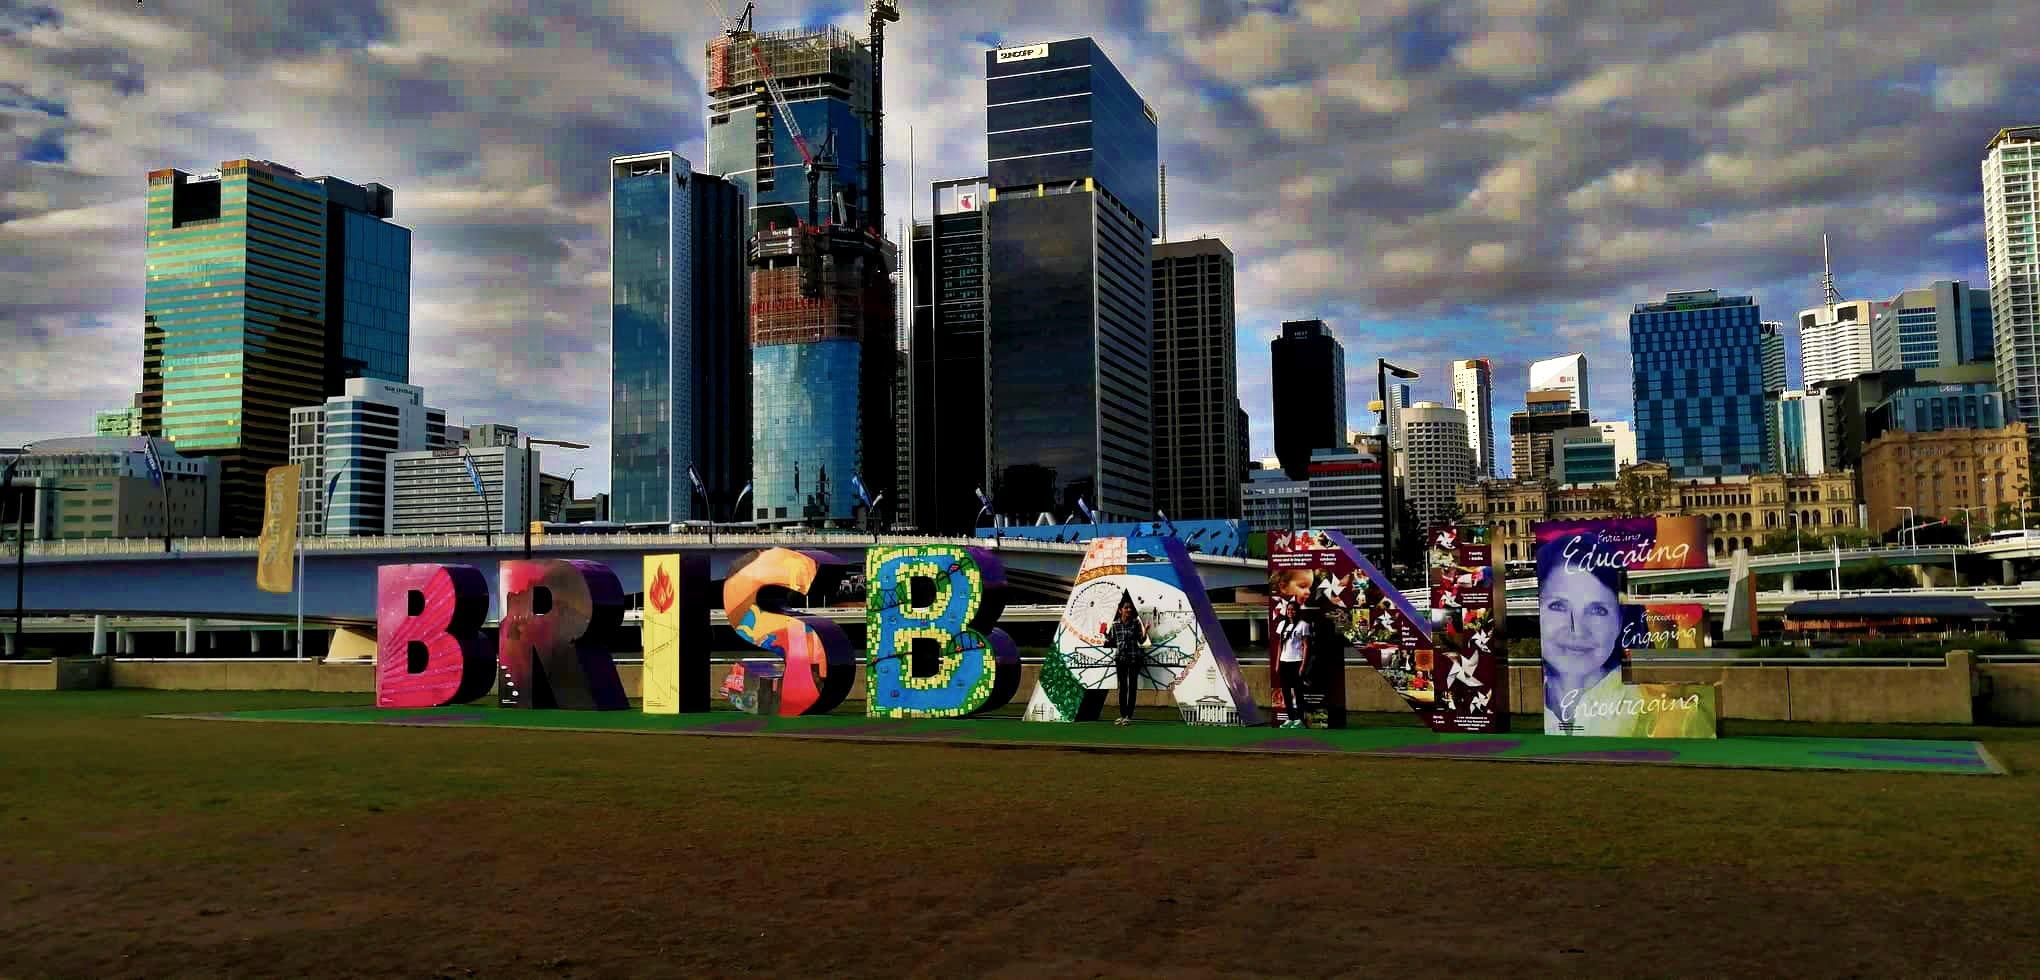 siti di incontri alternativi Australia è Graham Bunn incontri Ashlee